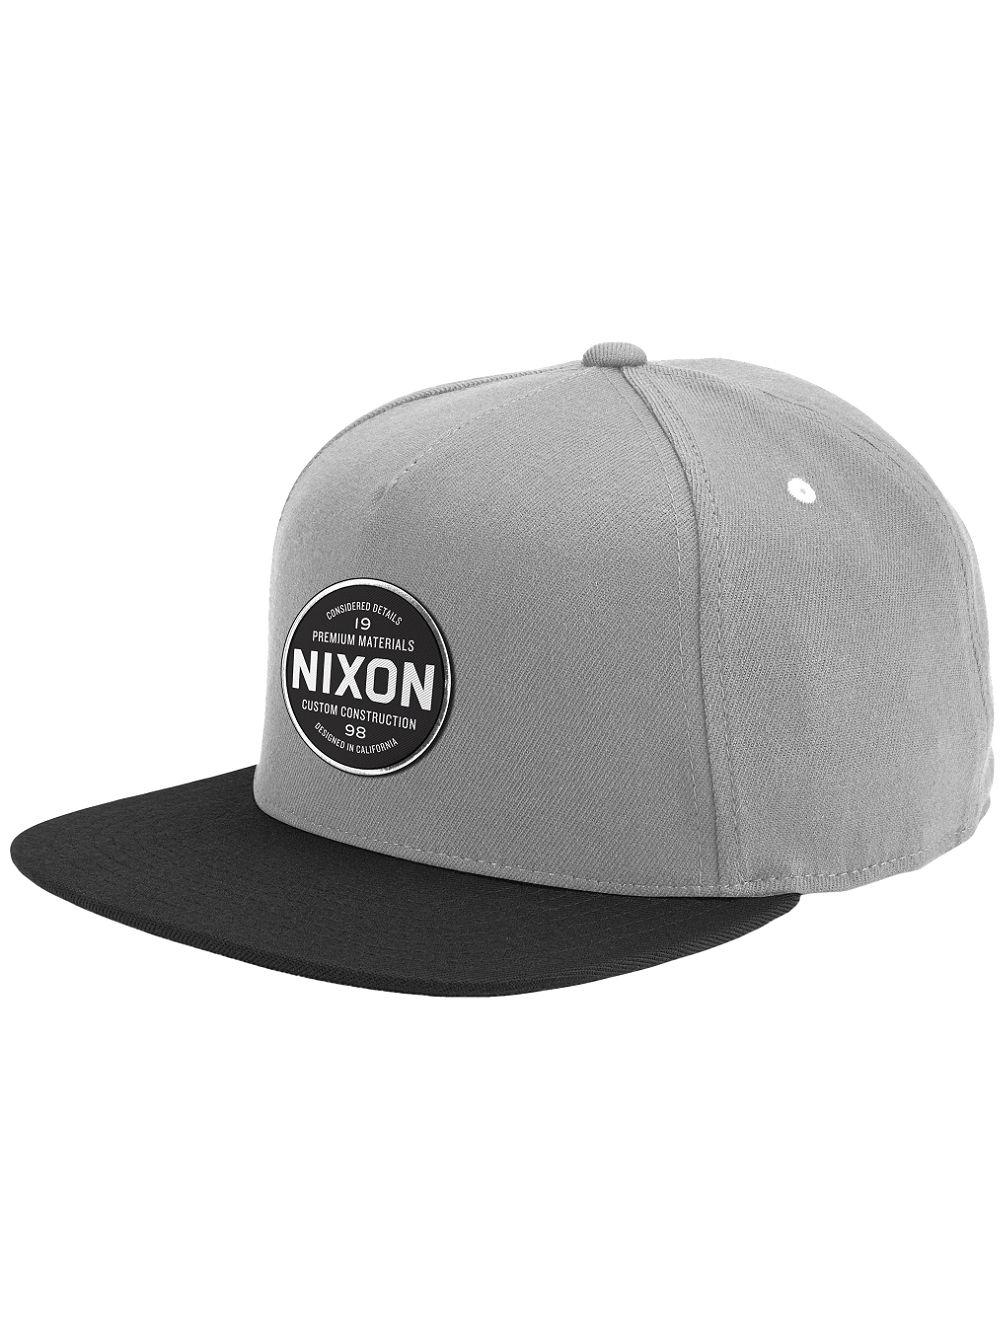 Buy Nixon Lazaro 110 Snapback Cap online at blue-tomato.com 1225b4aa4a4b